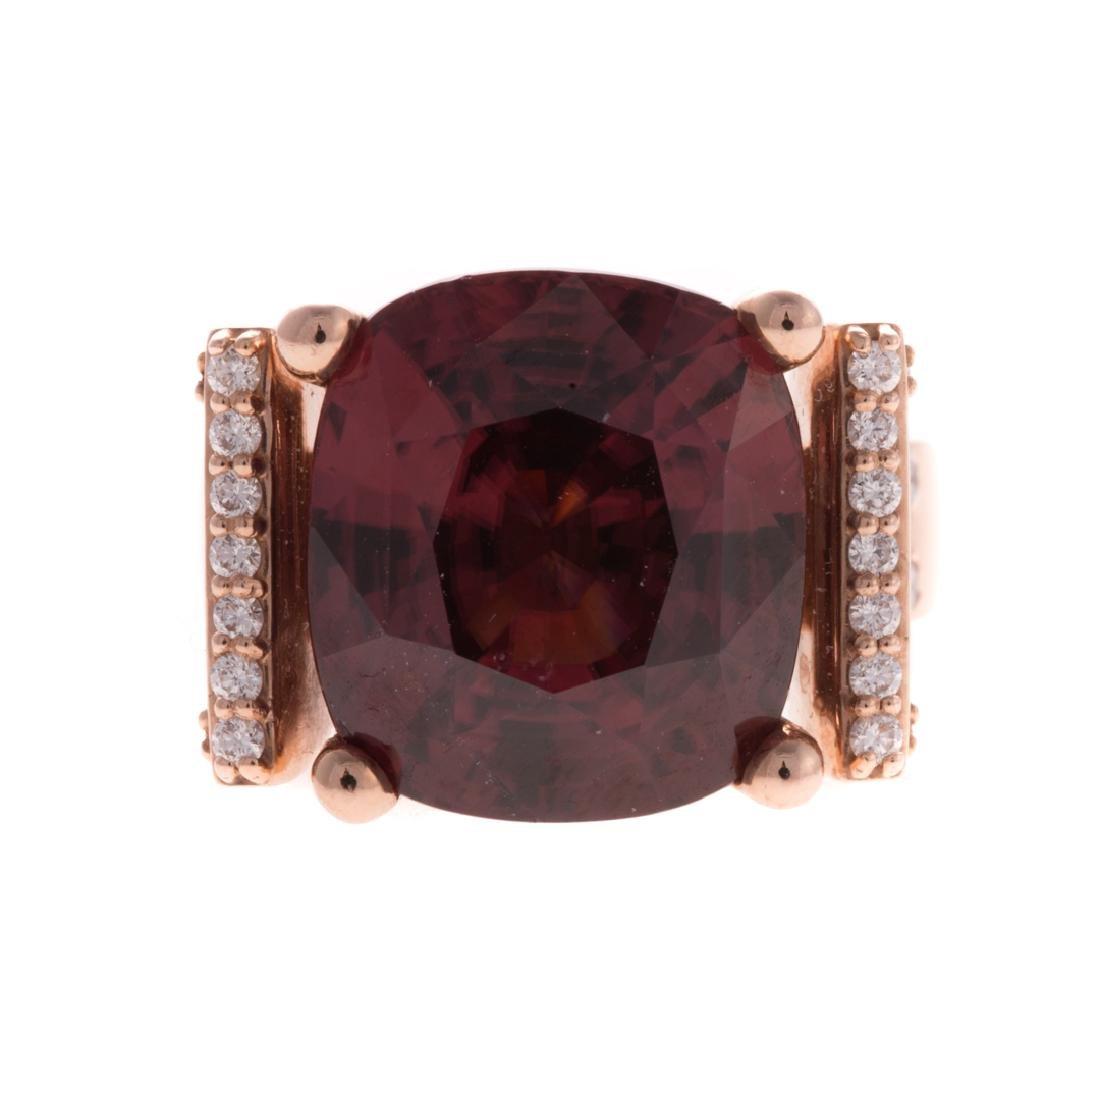 A Rare 17.43ct Red Zircon & Diamond Ring